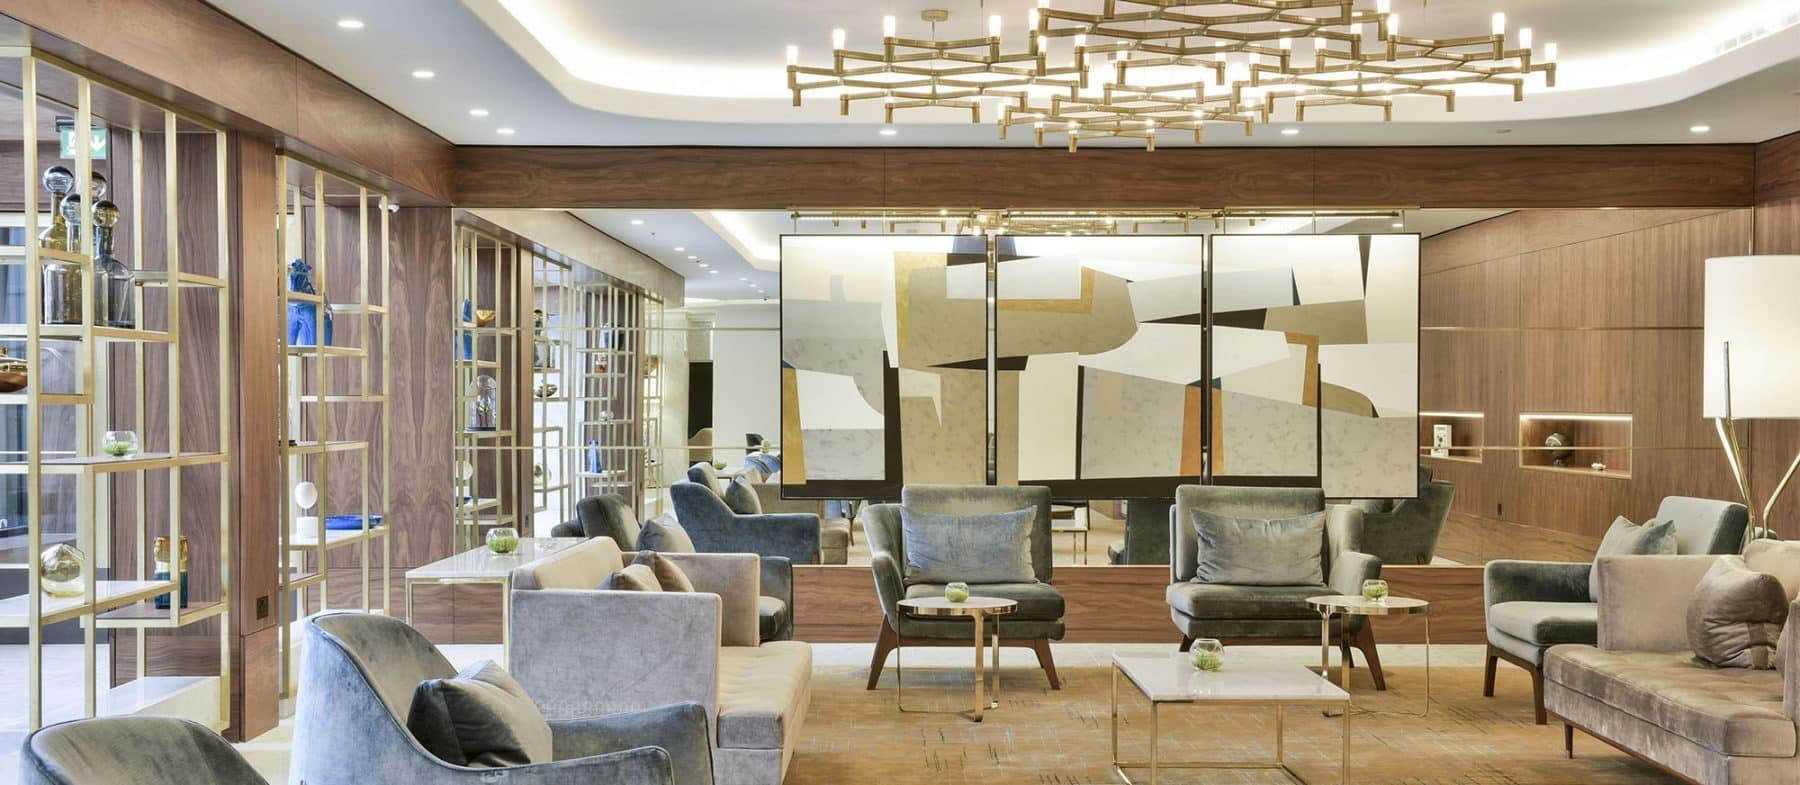 5 Star Hotels Facilities